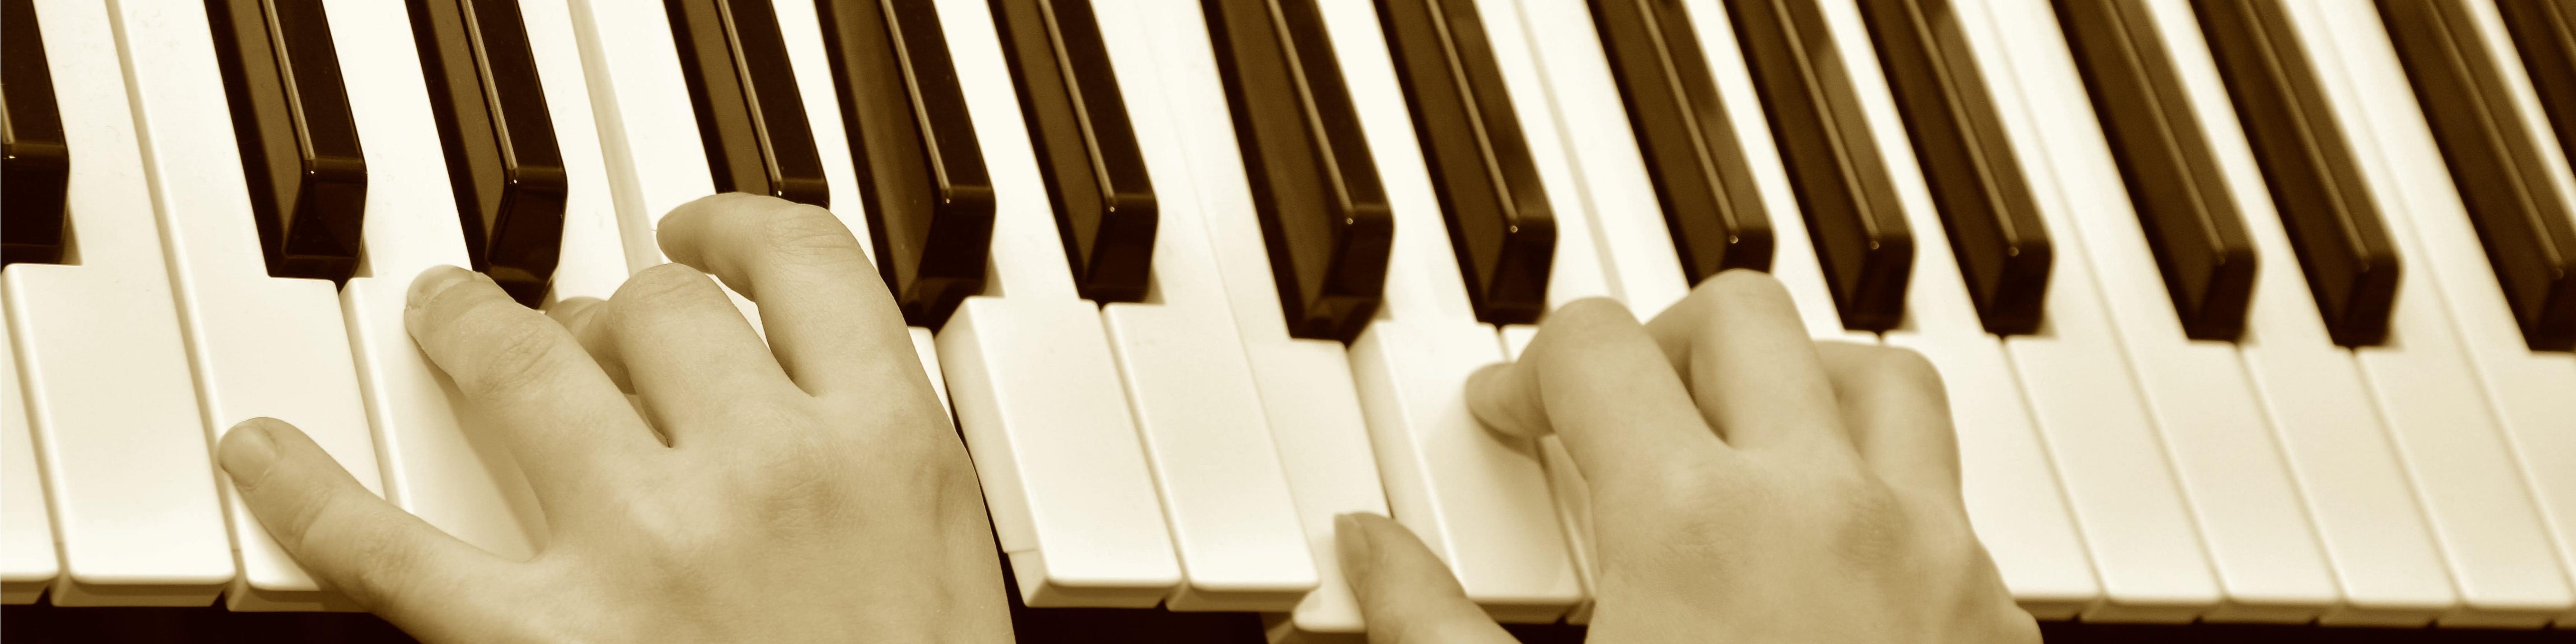 keyboard_5700*1425